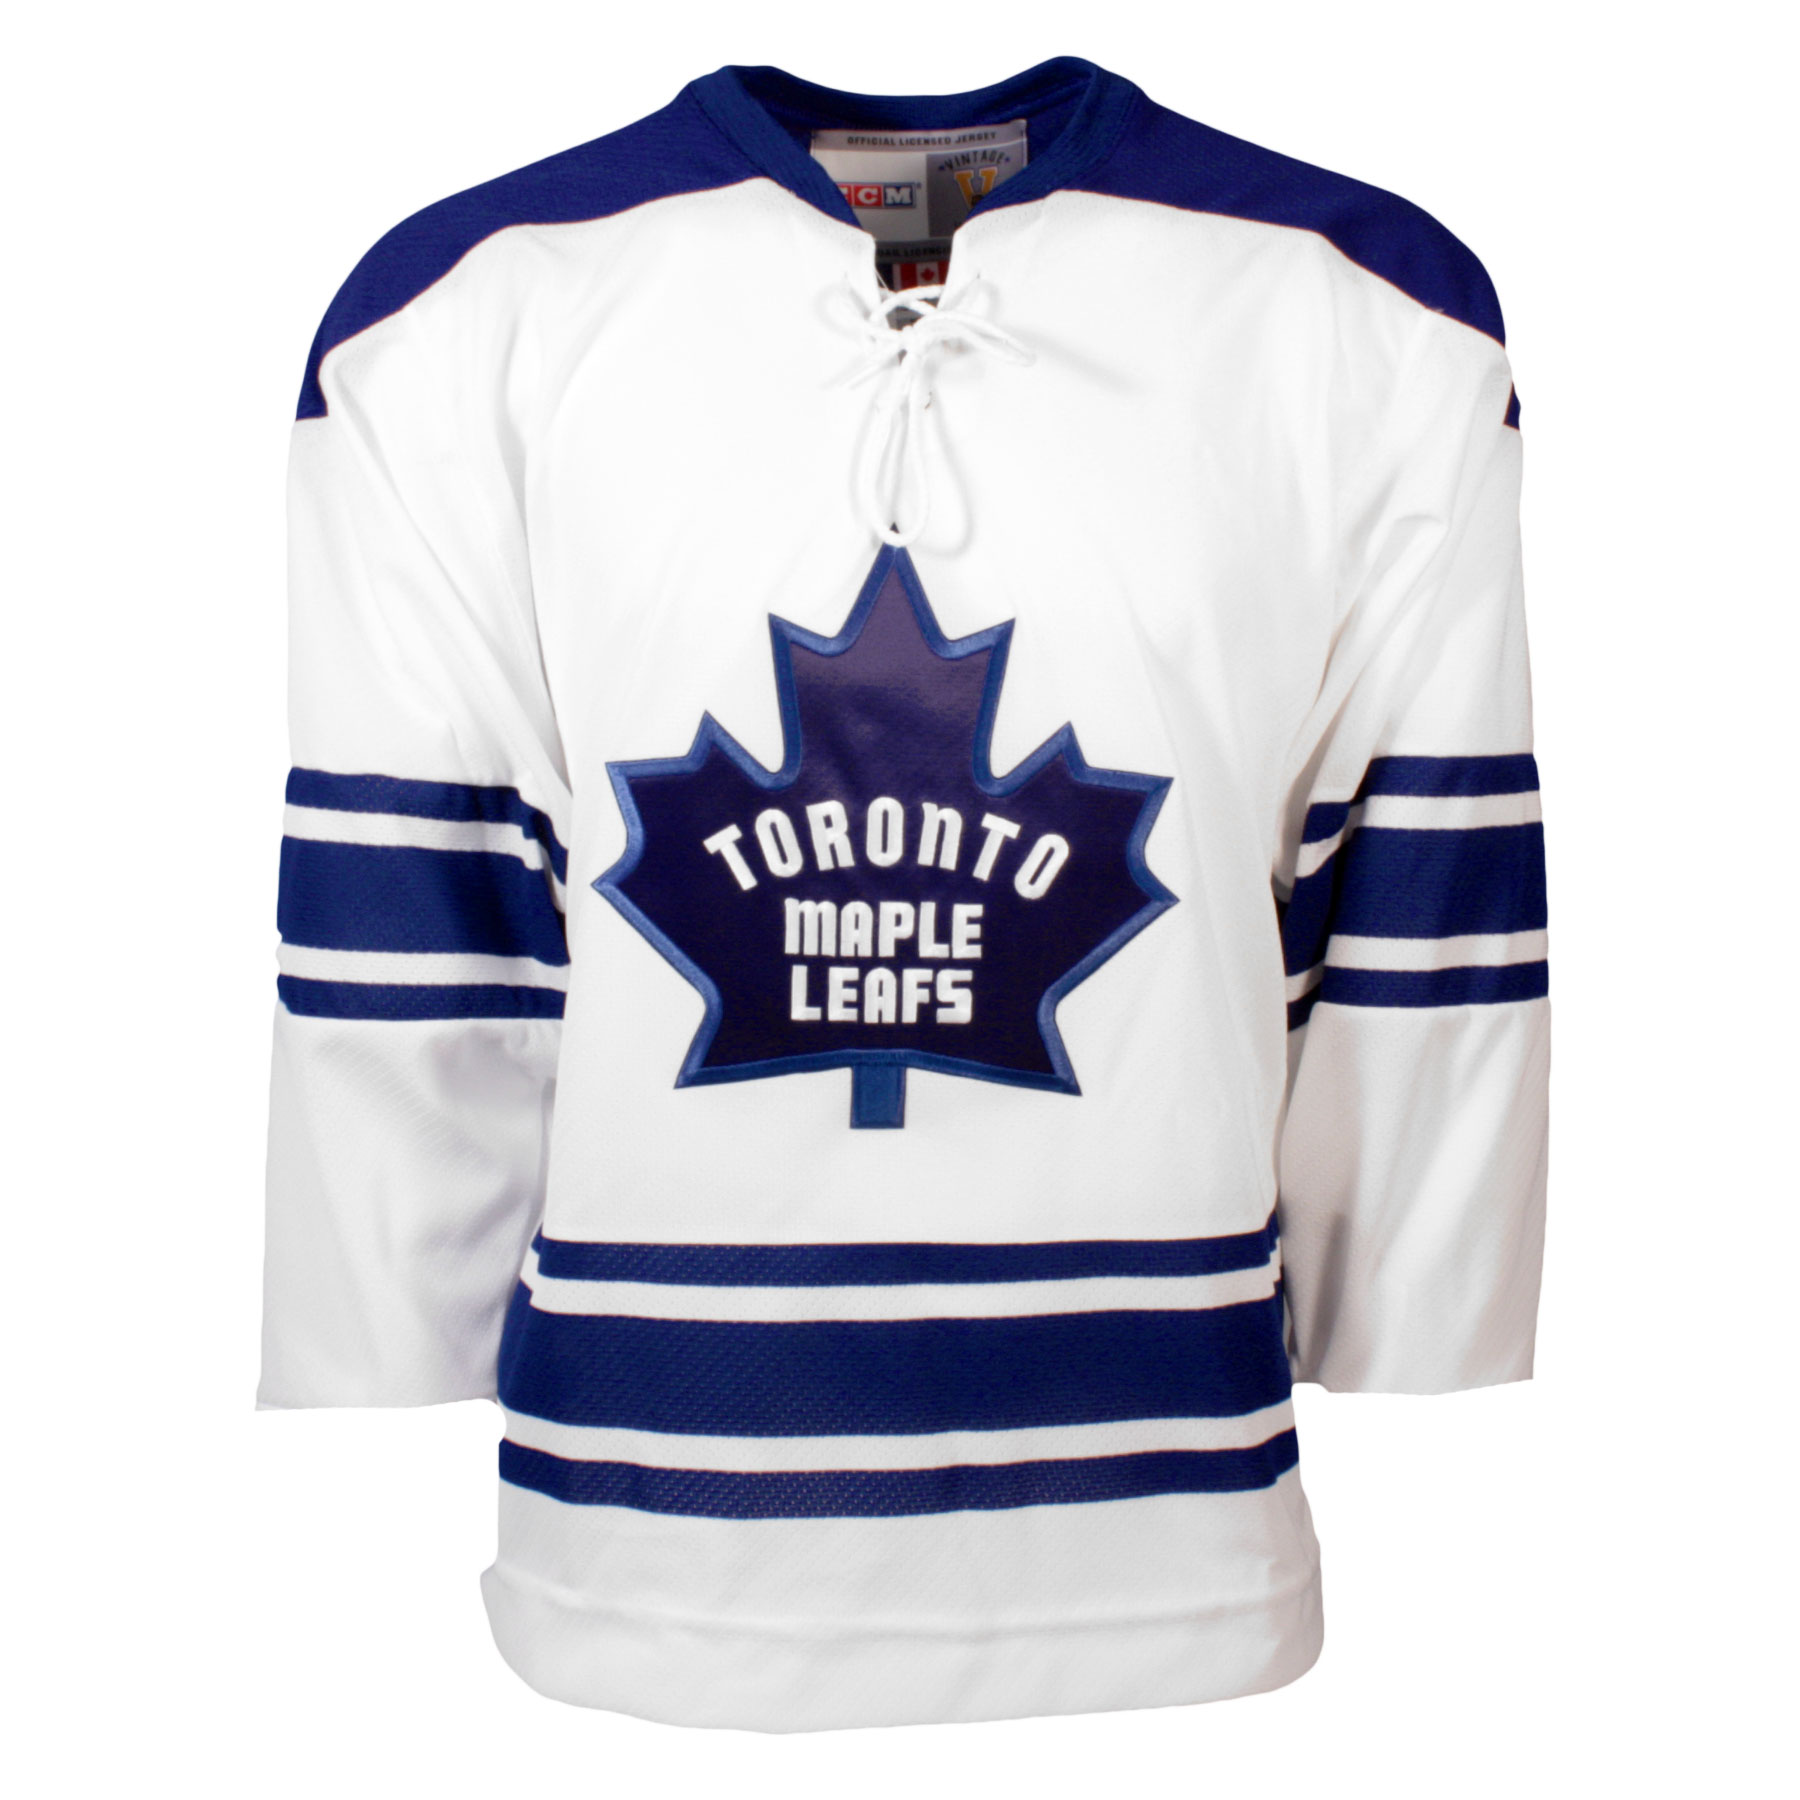 sports shoes f46ea a915b Toronto Maple Leafs Vintage Replica Jersey 1967 (Home ...